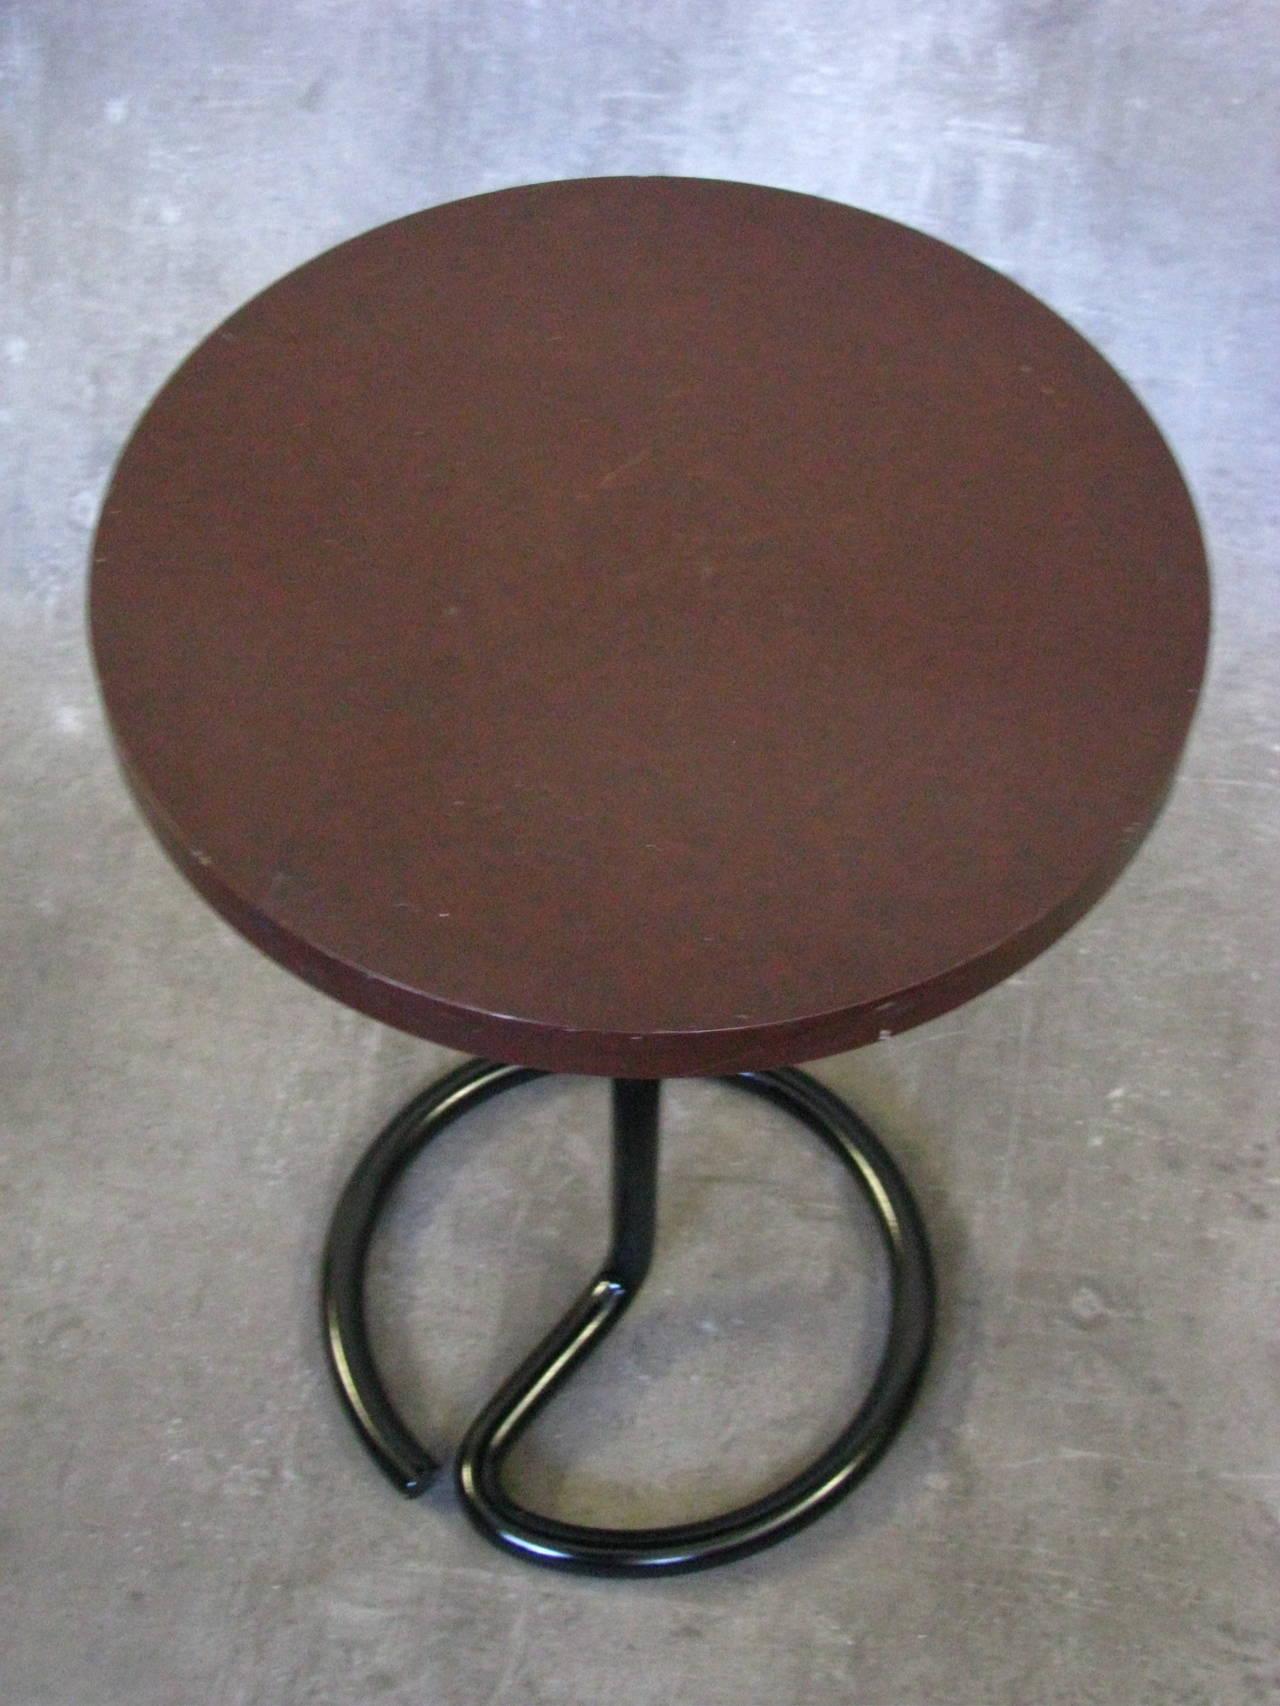 Art Deco Side Coffee Table by Rene Herbst Bakelite, 1940 For Sale 1